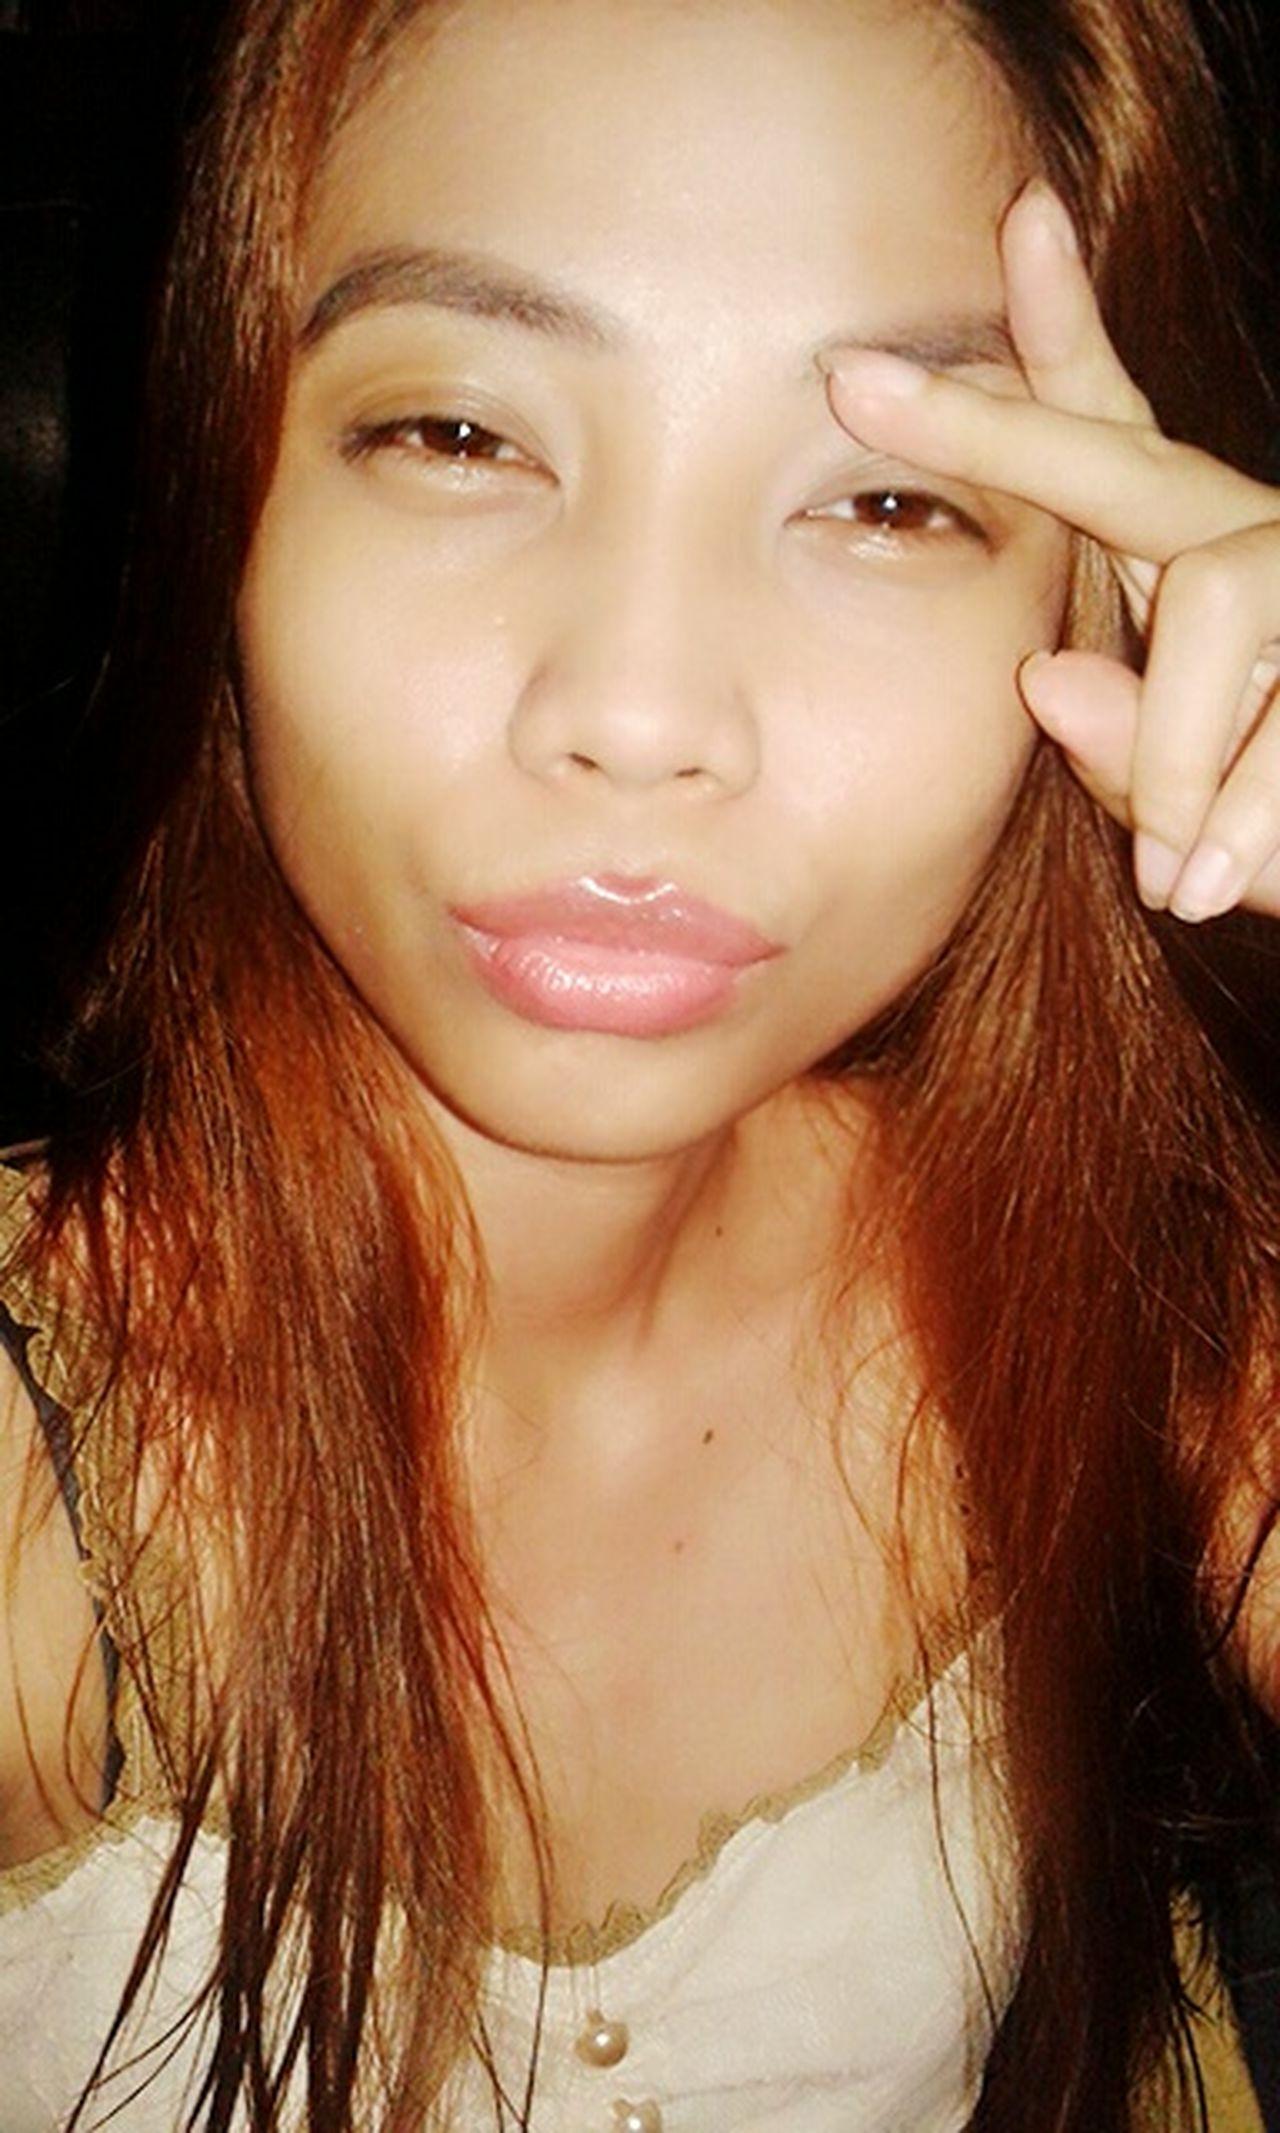 Hi! That's Me Peace Selfie ✌ Wackyface WackyWednesday Cheese! Stay True, Be YOU ❥ Cuteness KAWAII